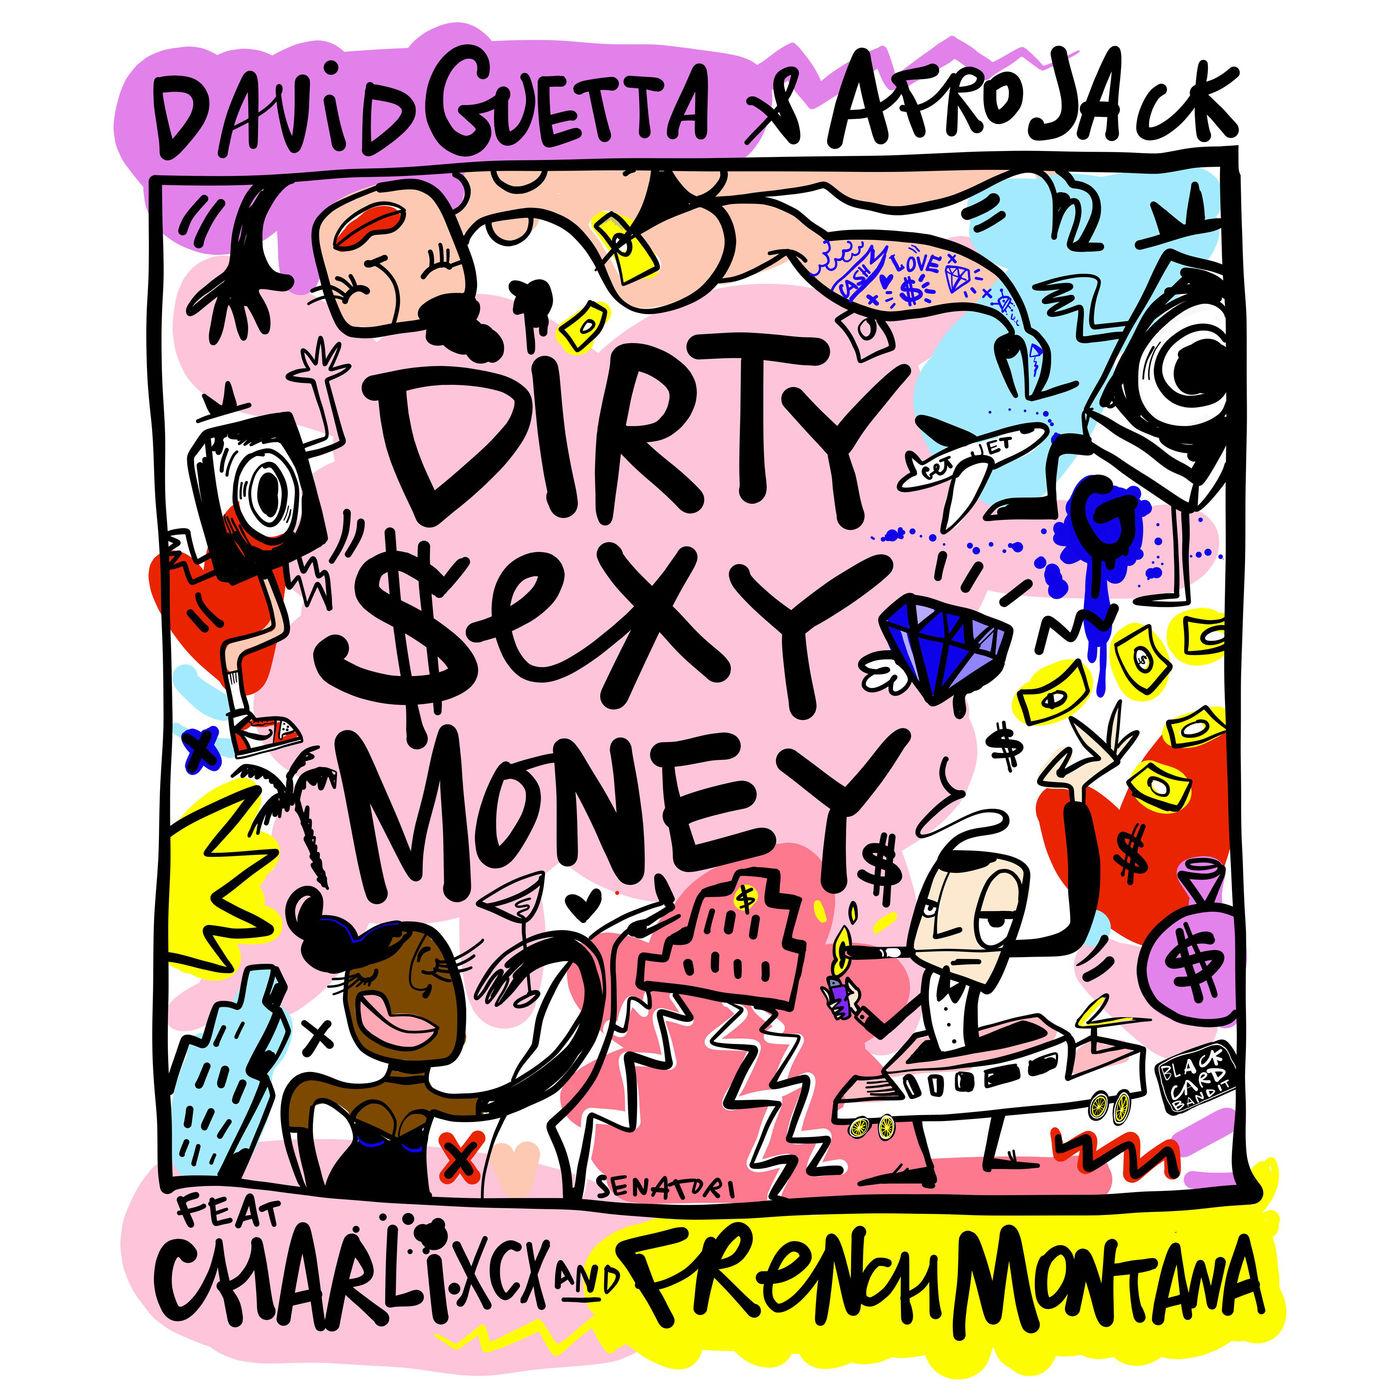 David Guetta & Afrojack - Dirty Sexy Money (feat. Charli XCX & French Montana) - Single